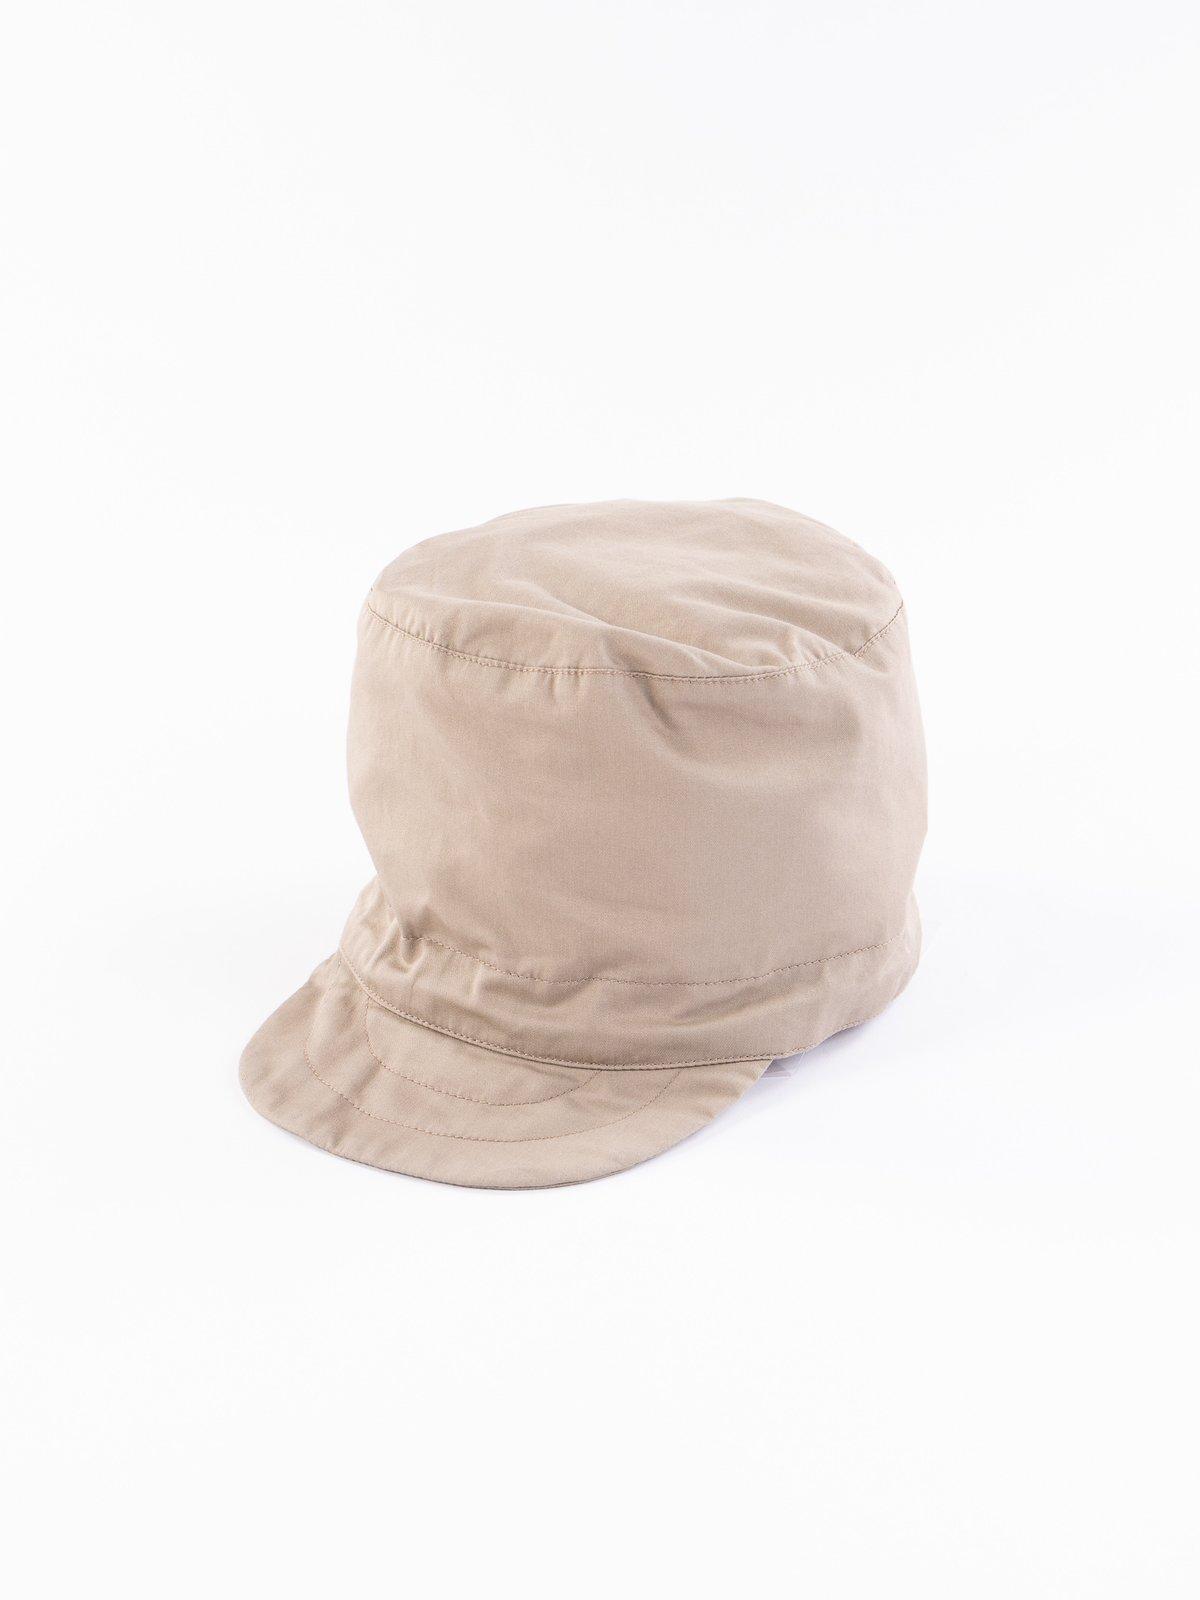 Khaki Highcount Twill FM Cap - Image 1